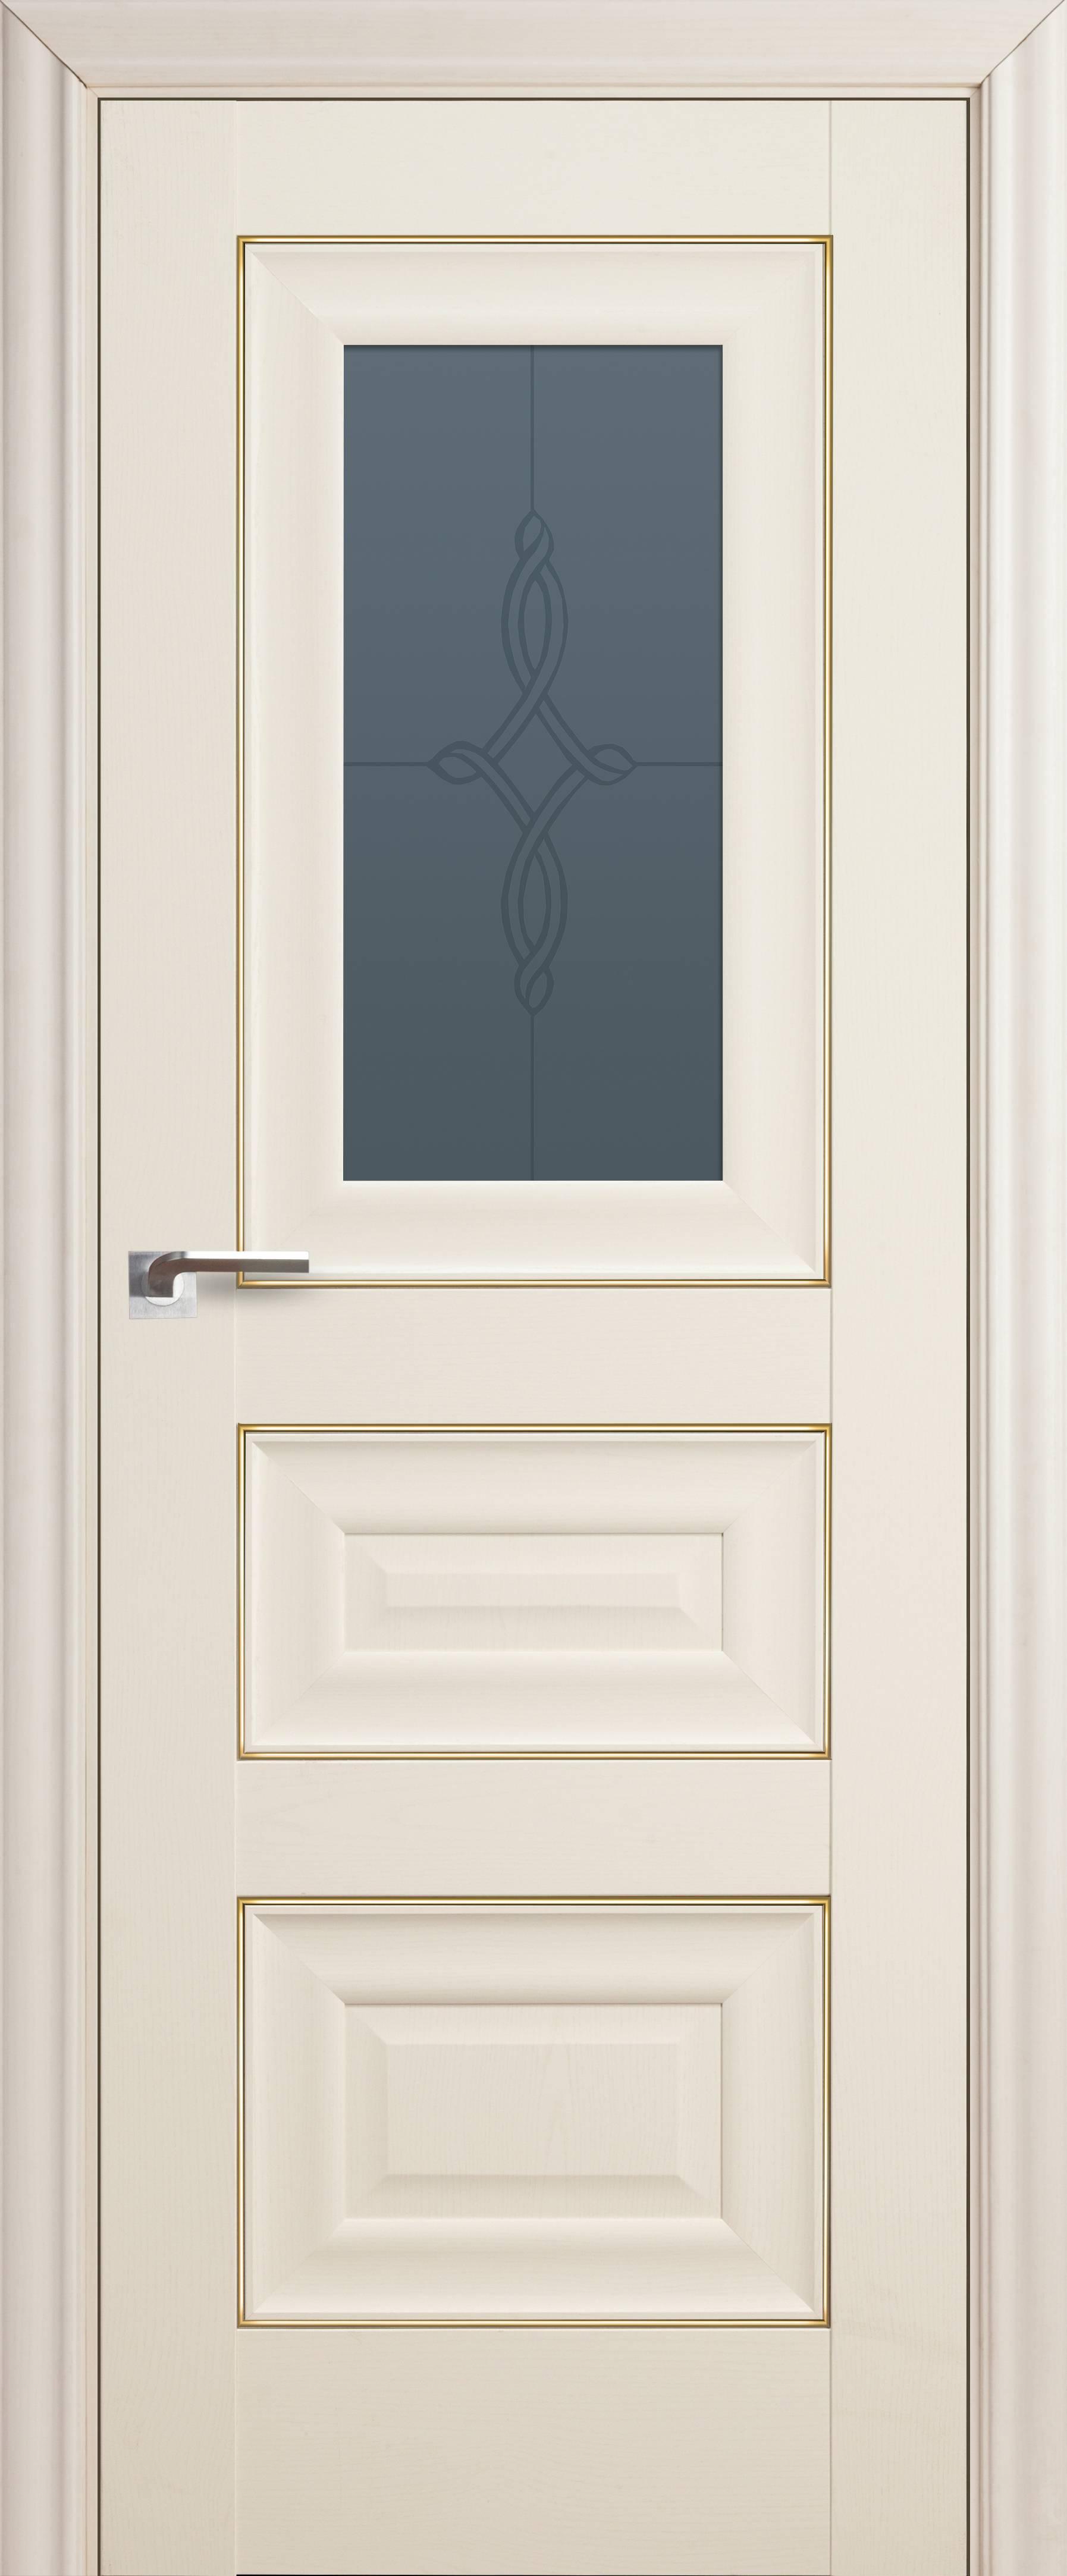 Фото двери Модель 26Х